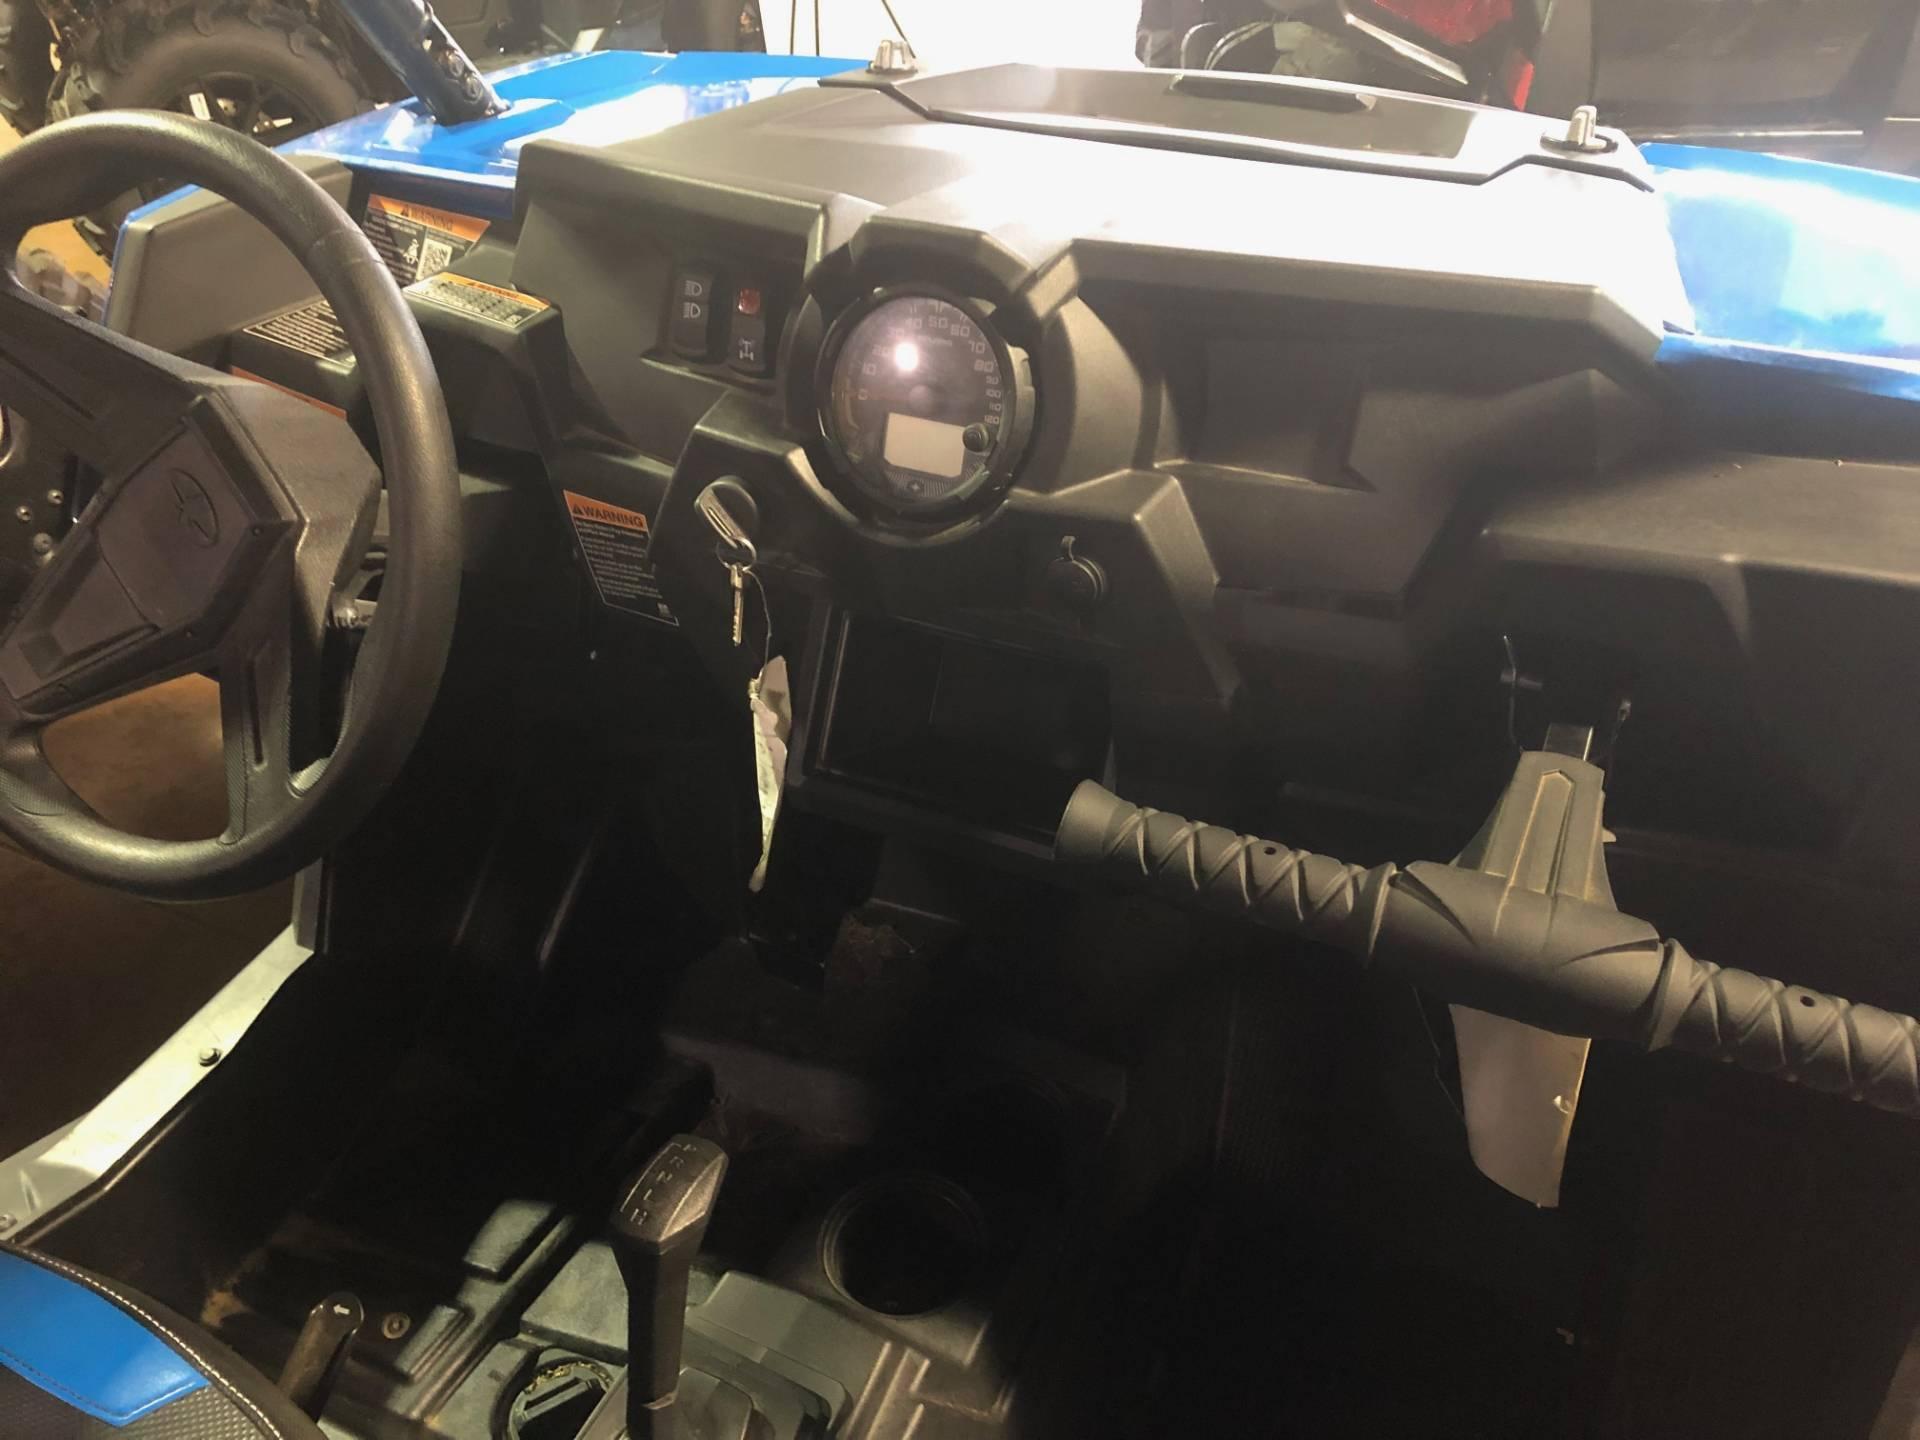 2017 Polaris RZR S 900 EPS in Mount Pleasant, Texas